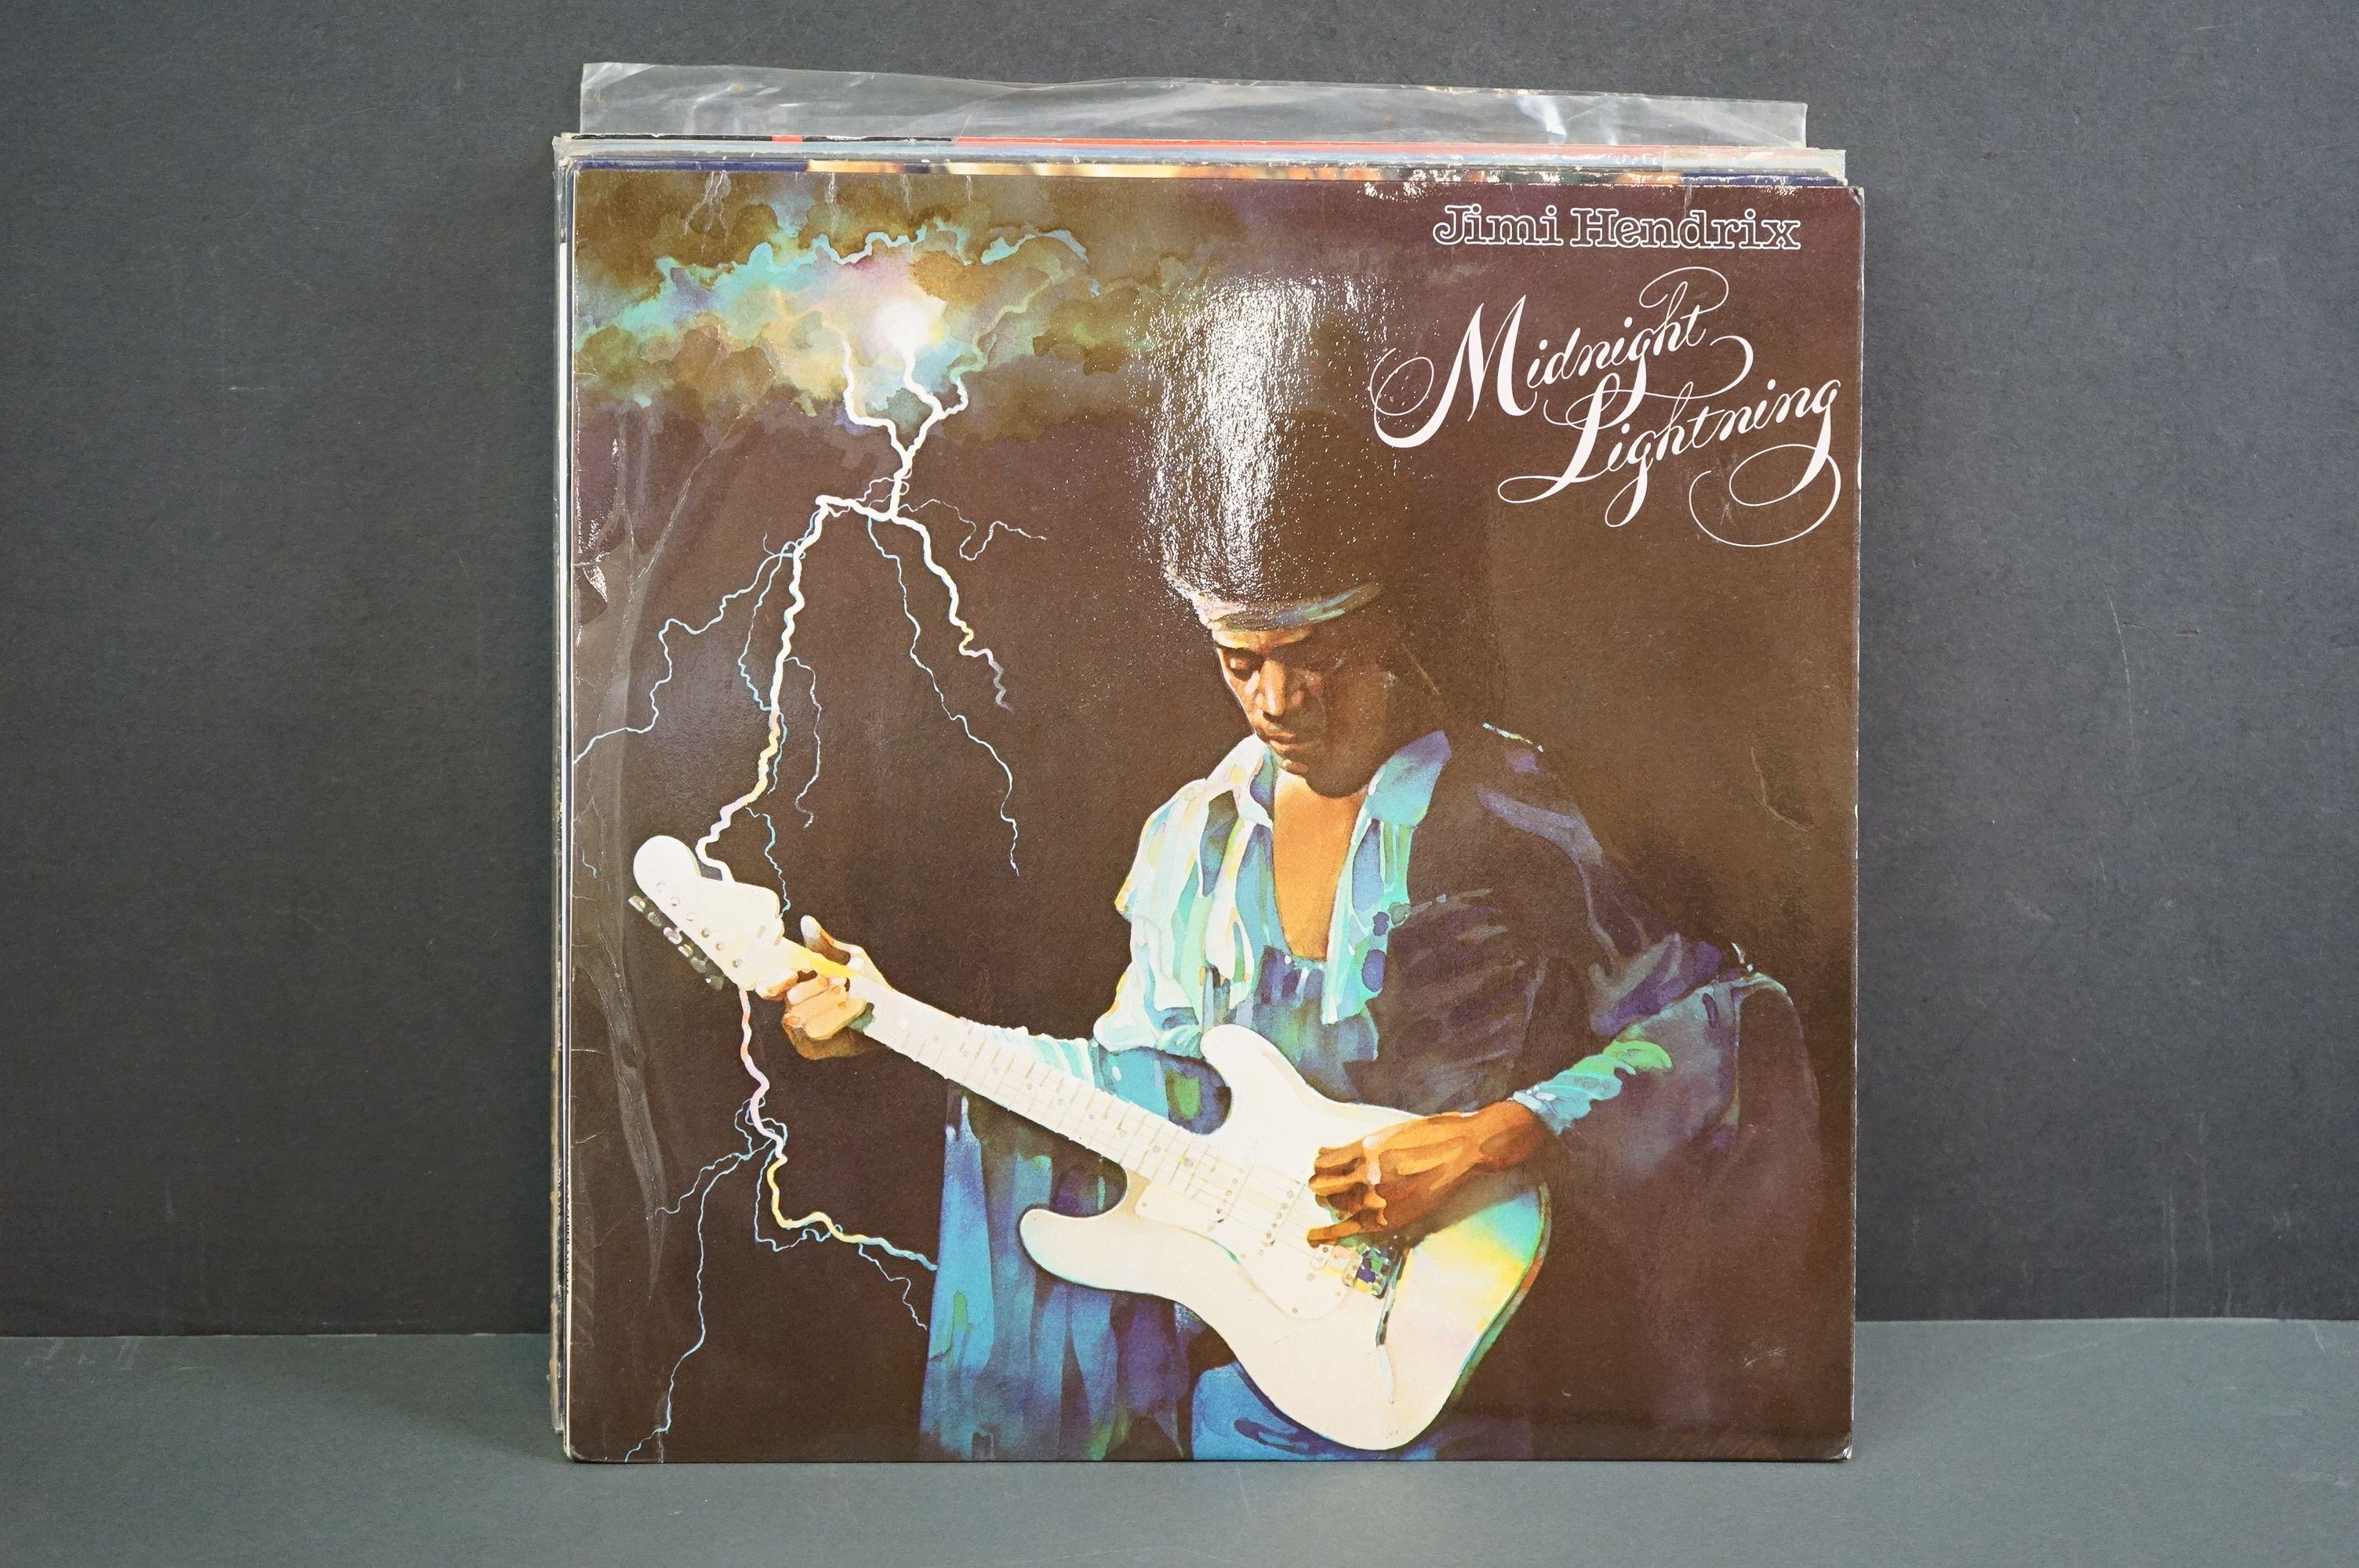 Vinyl - Nine Jimi Hendrix LPs to include Smash Hits, Hey Joe (Italian pressing), Stone Free, Jimi - Image 2 of 9